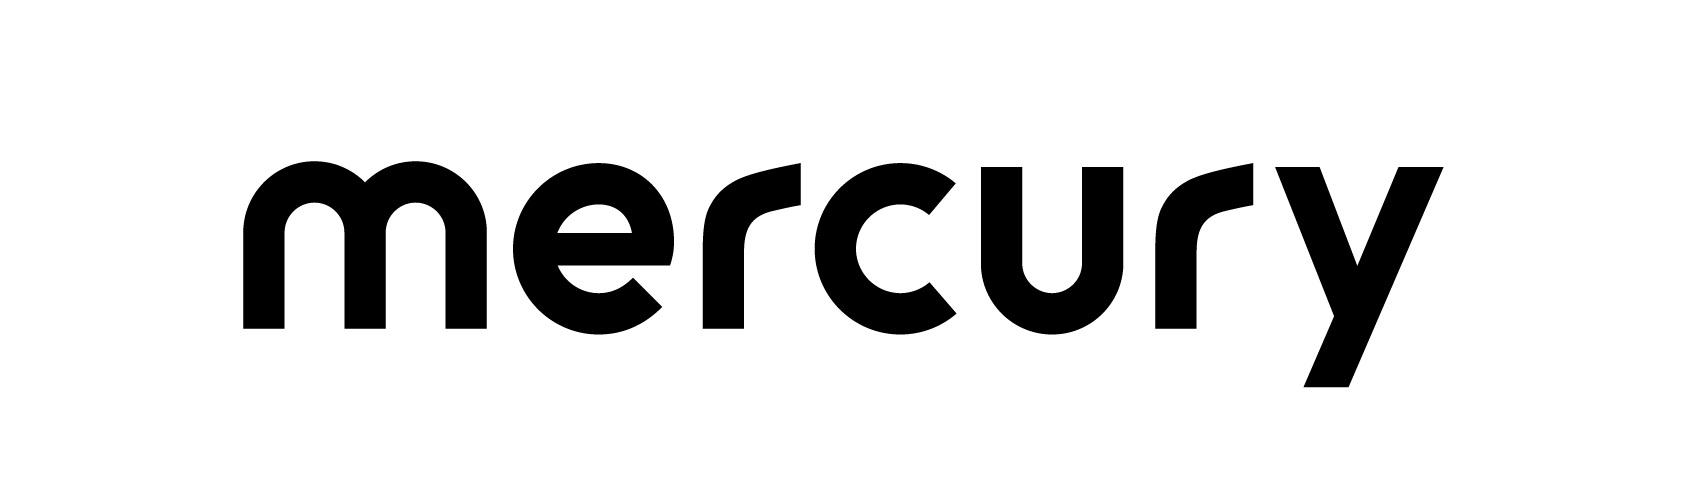 MERCURY_WORDMARKXBLACKXRGBA.JPG